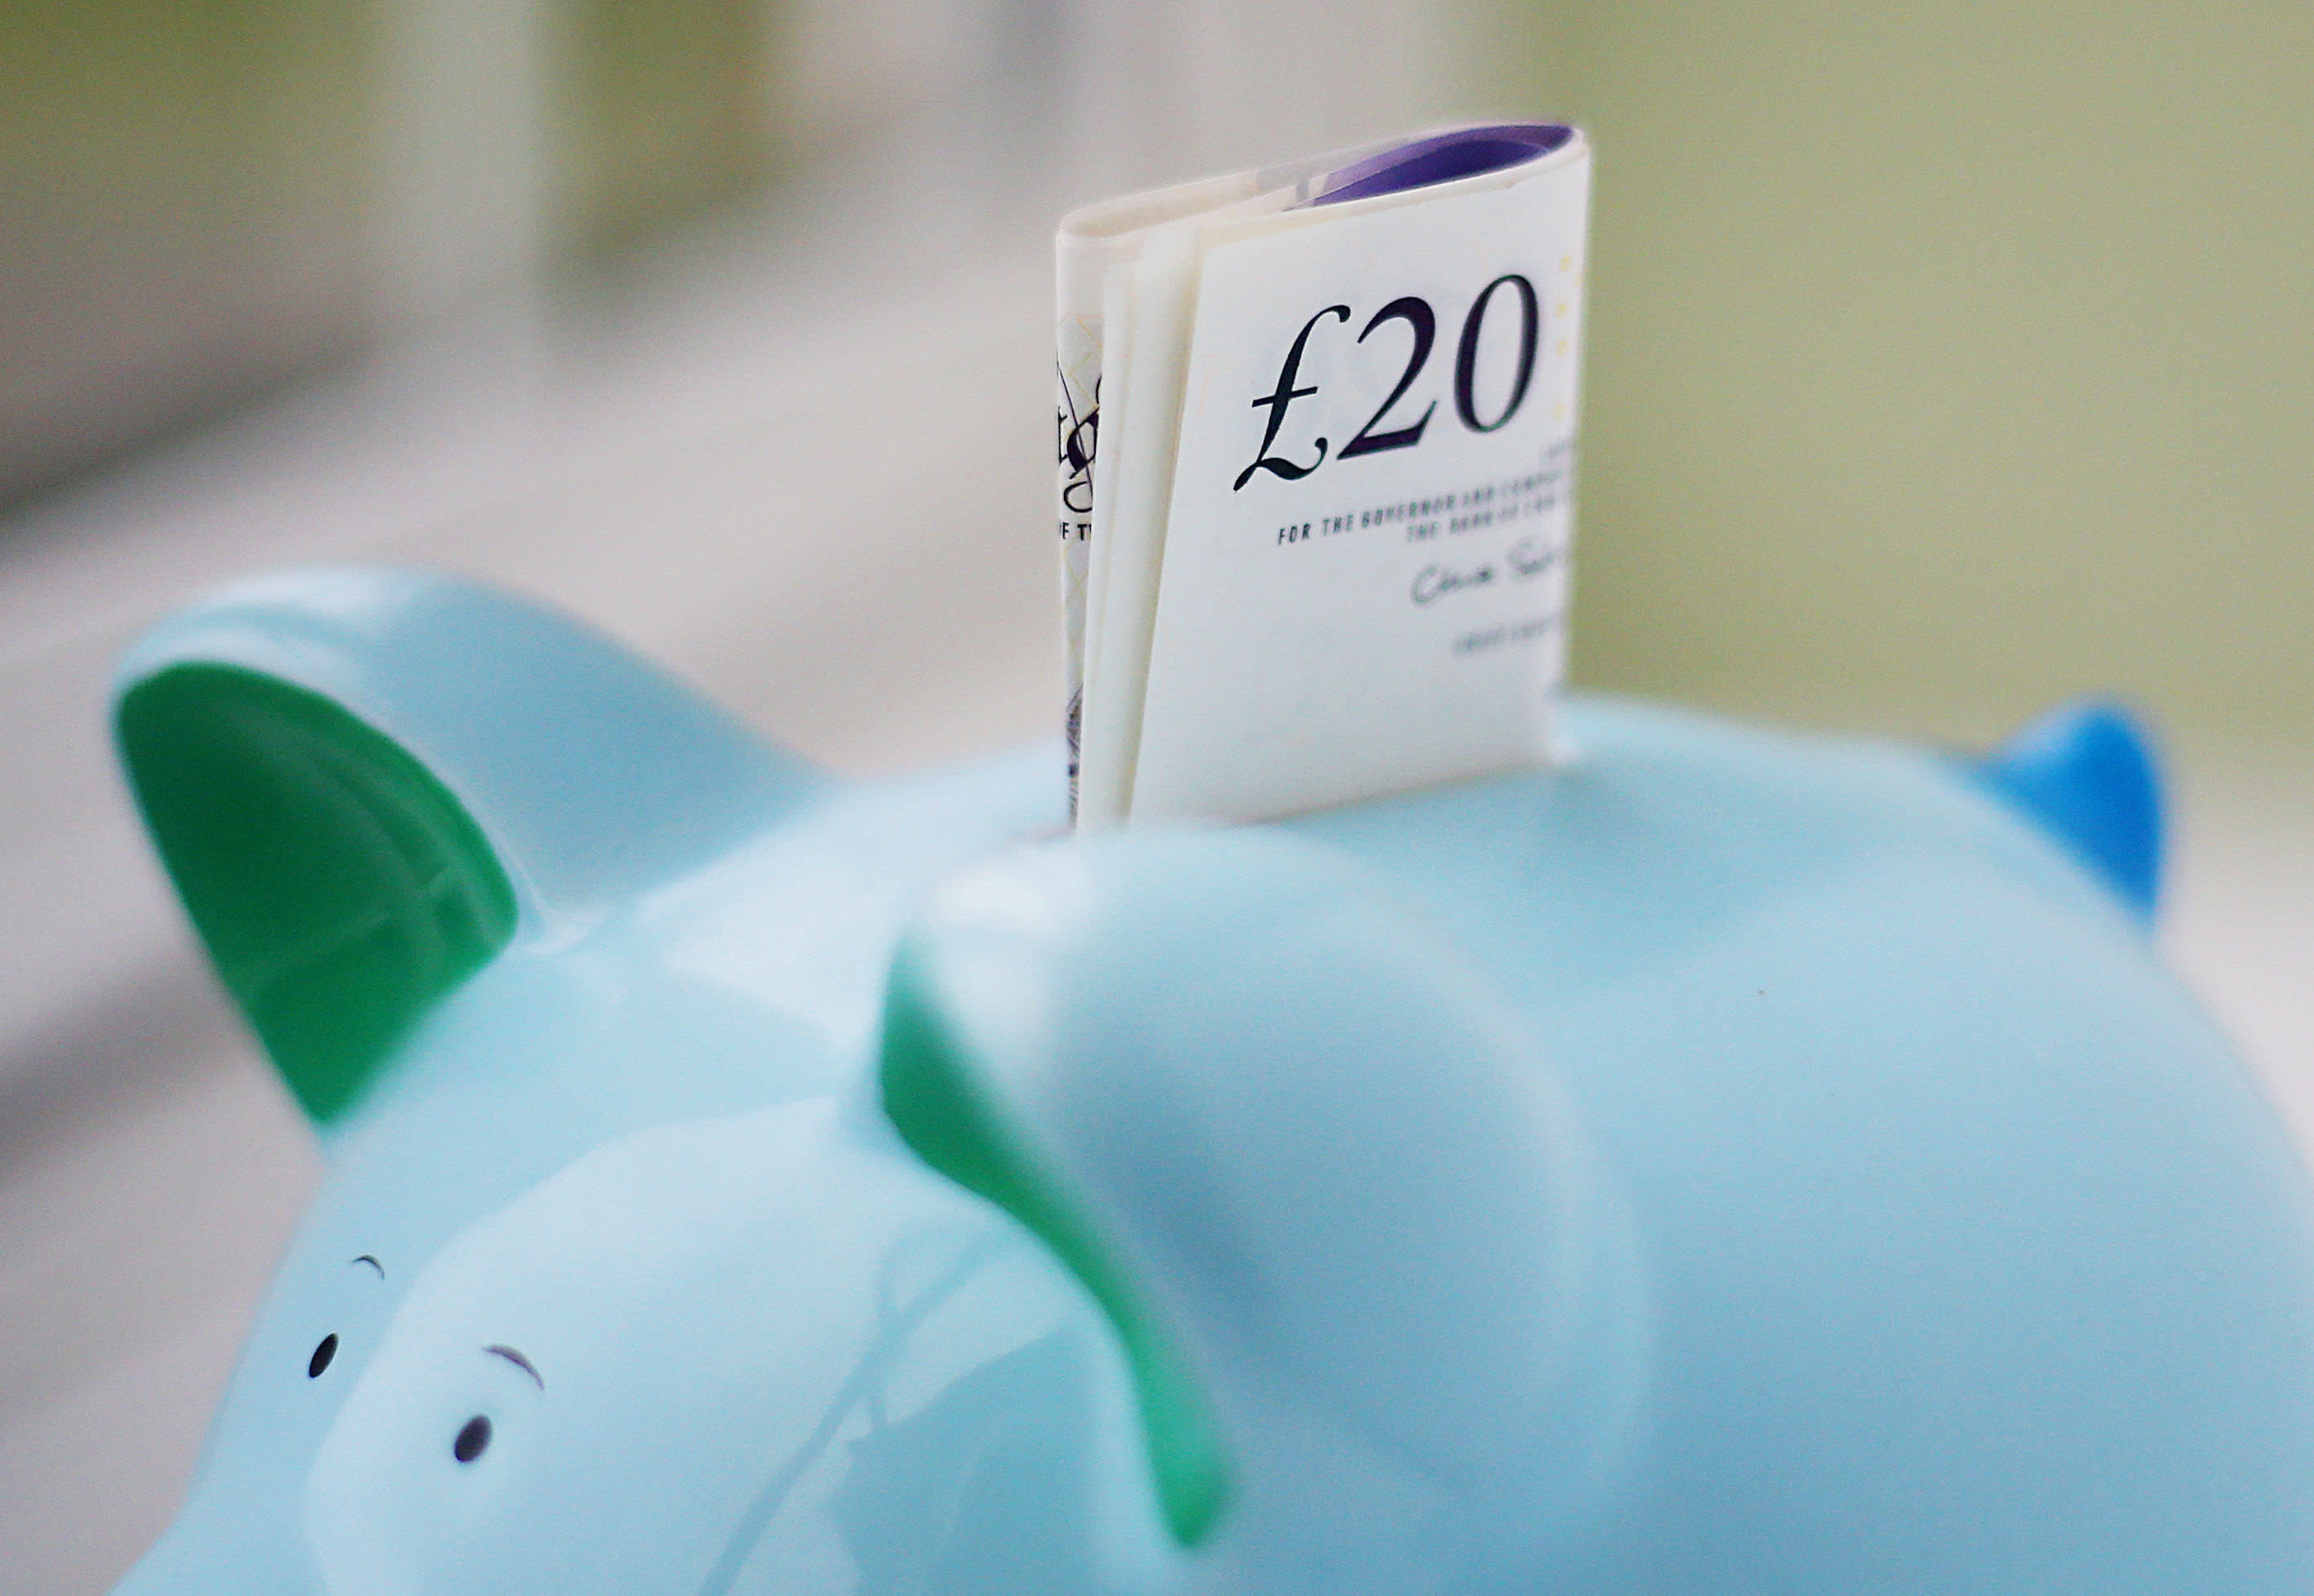 Majority of savers want mandatory pension contributions